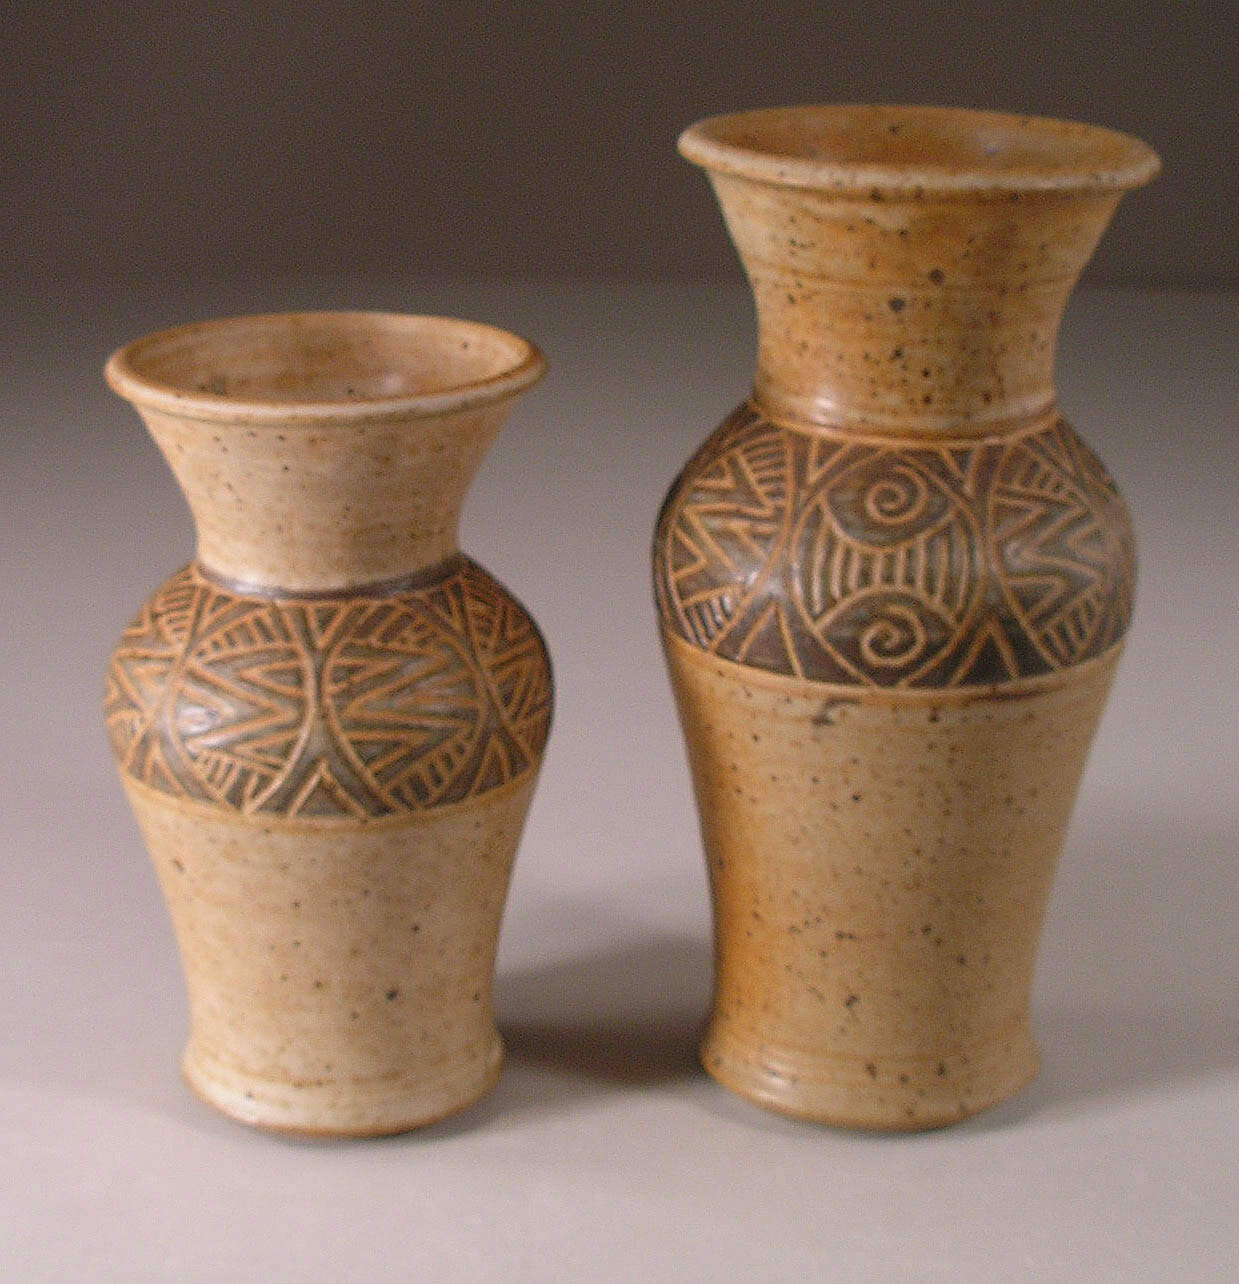 Slip Vases, Small and Medium